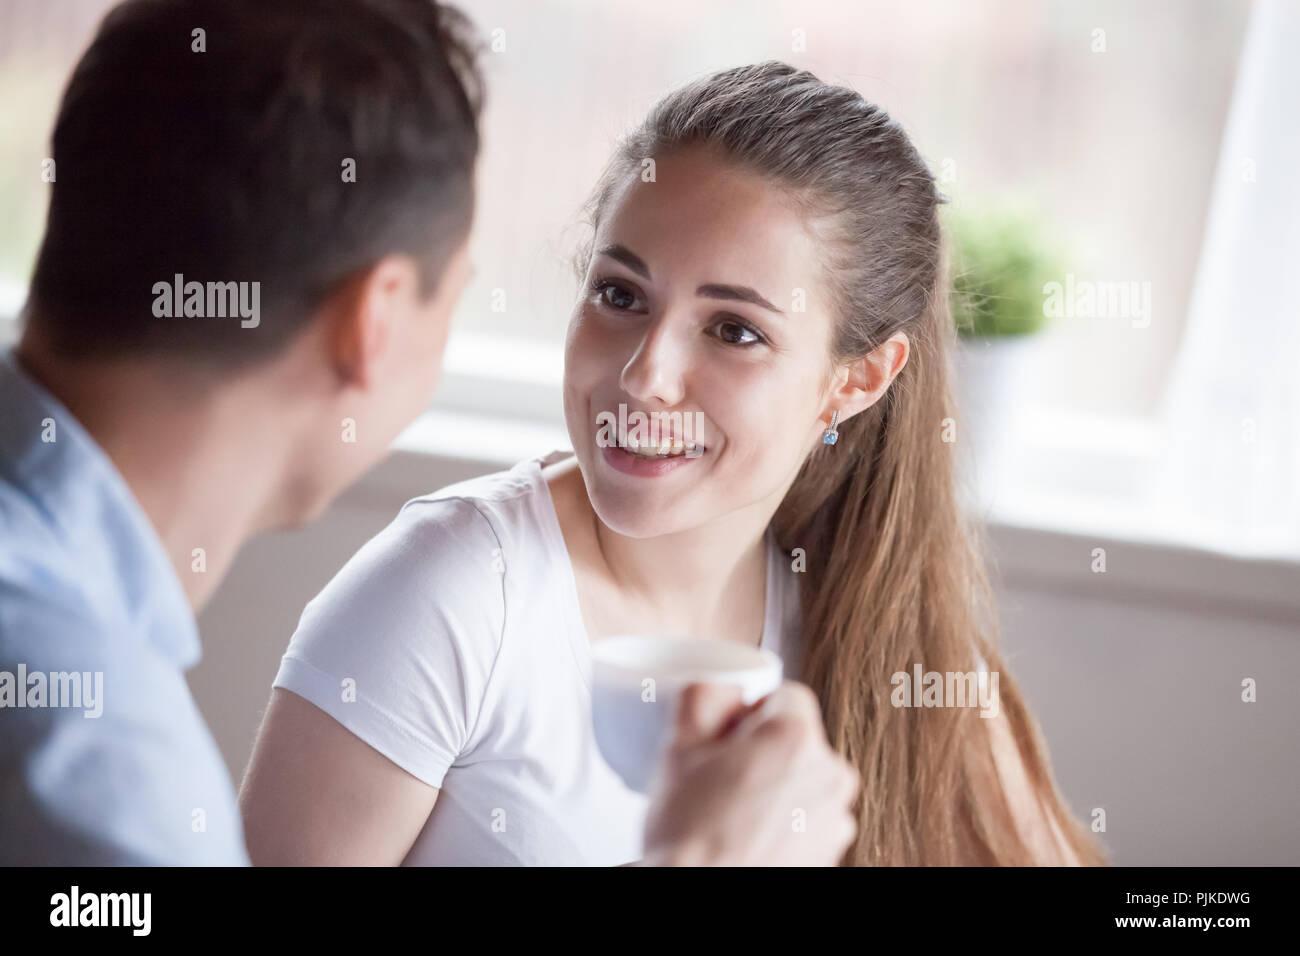 Close up of happy woman man Photo Stock